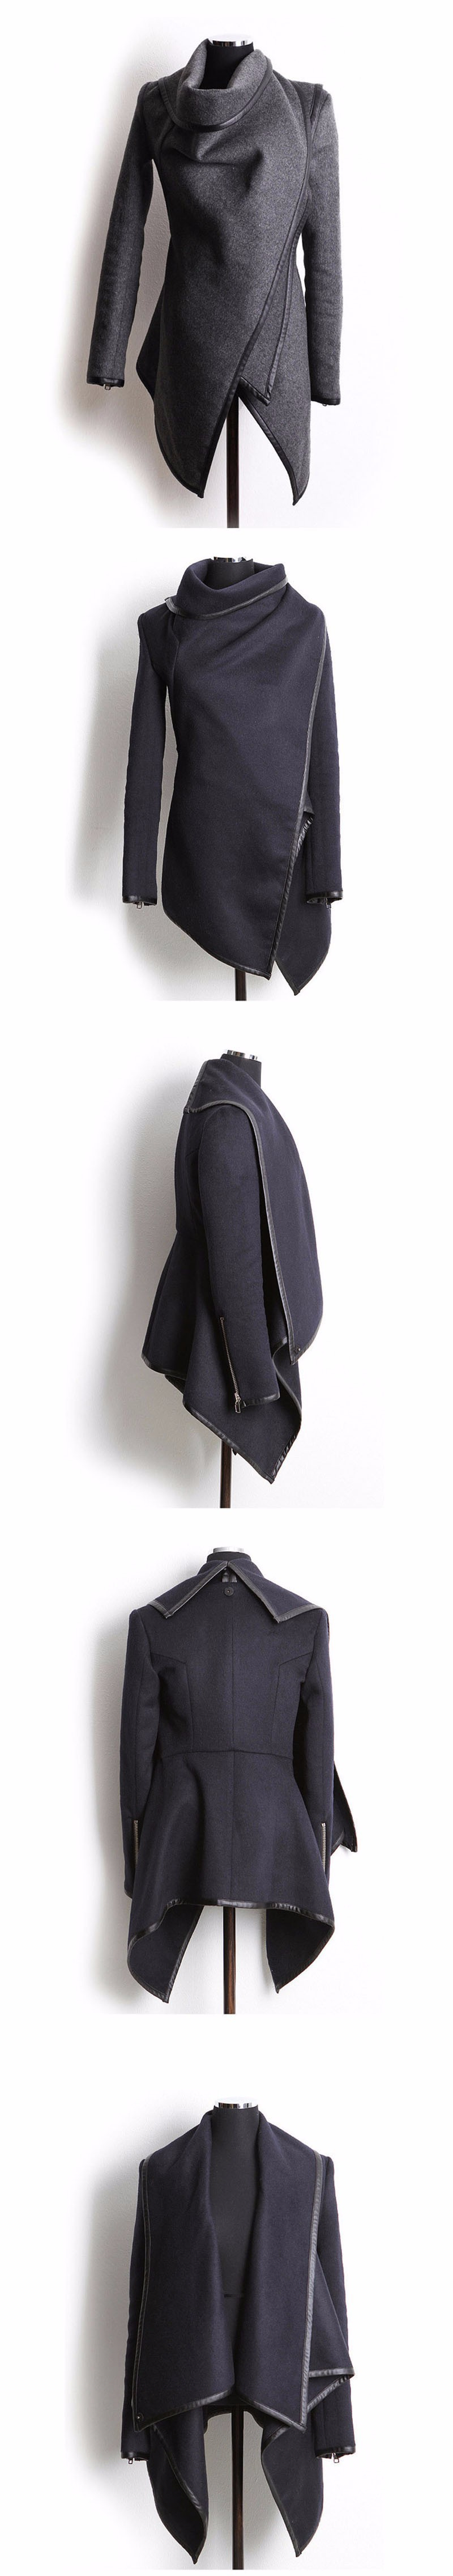 2015 New Fashion Winter Woolen Overcoat Women Jackets Woolen Coat Free Shipping Casaco FemininoTurn-Down Collar Zipper Jacket